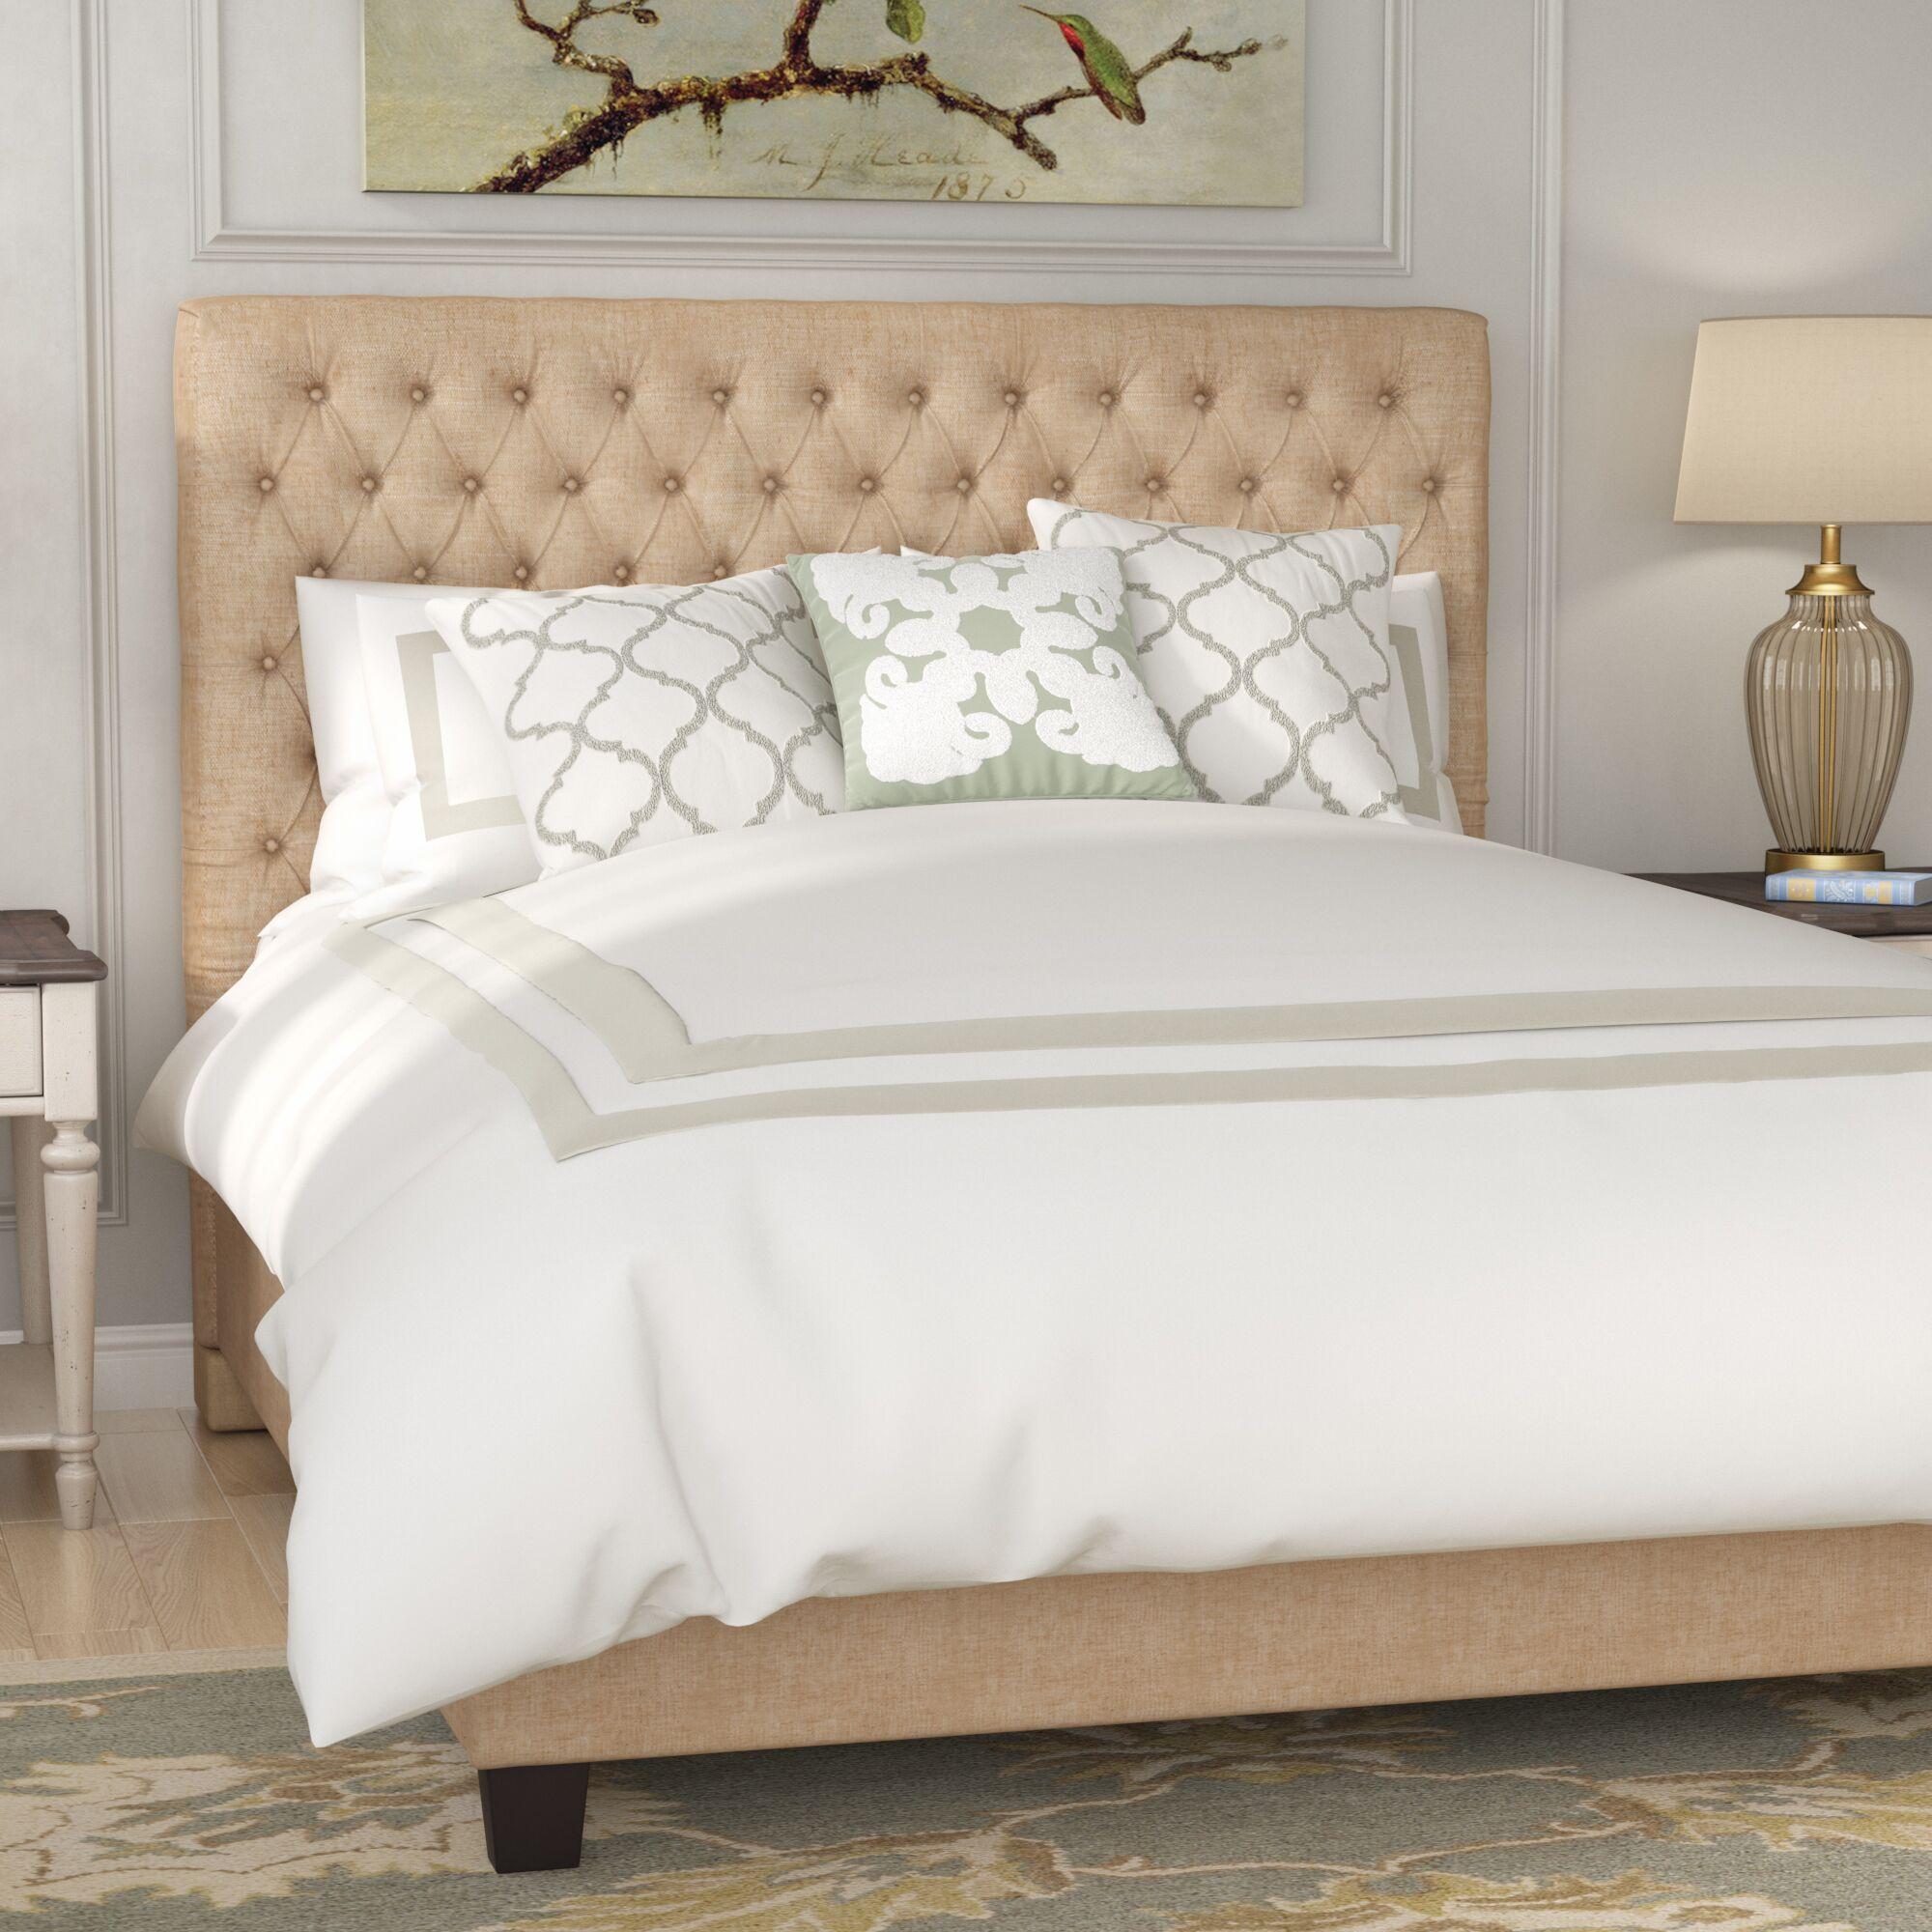 Fresnes Upholstered Panel Bed Size: Full, Headboard Color: Dark Beige